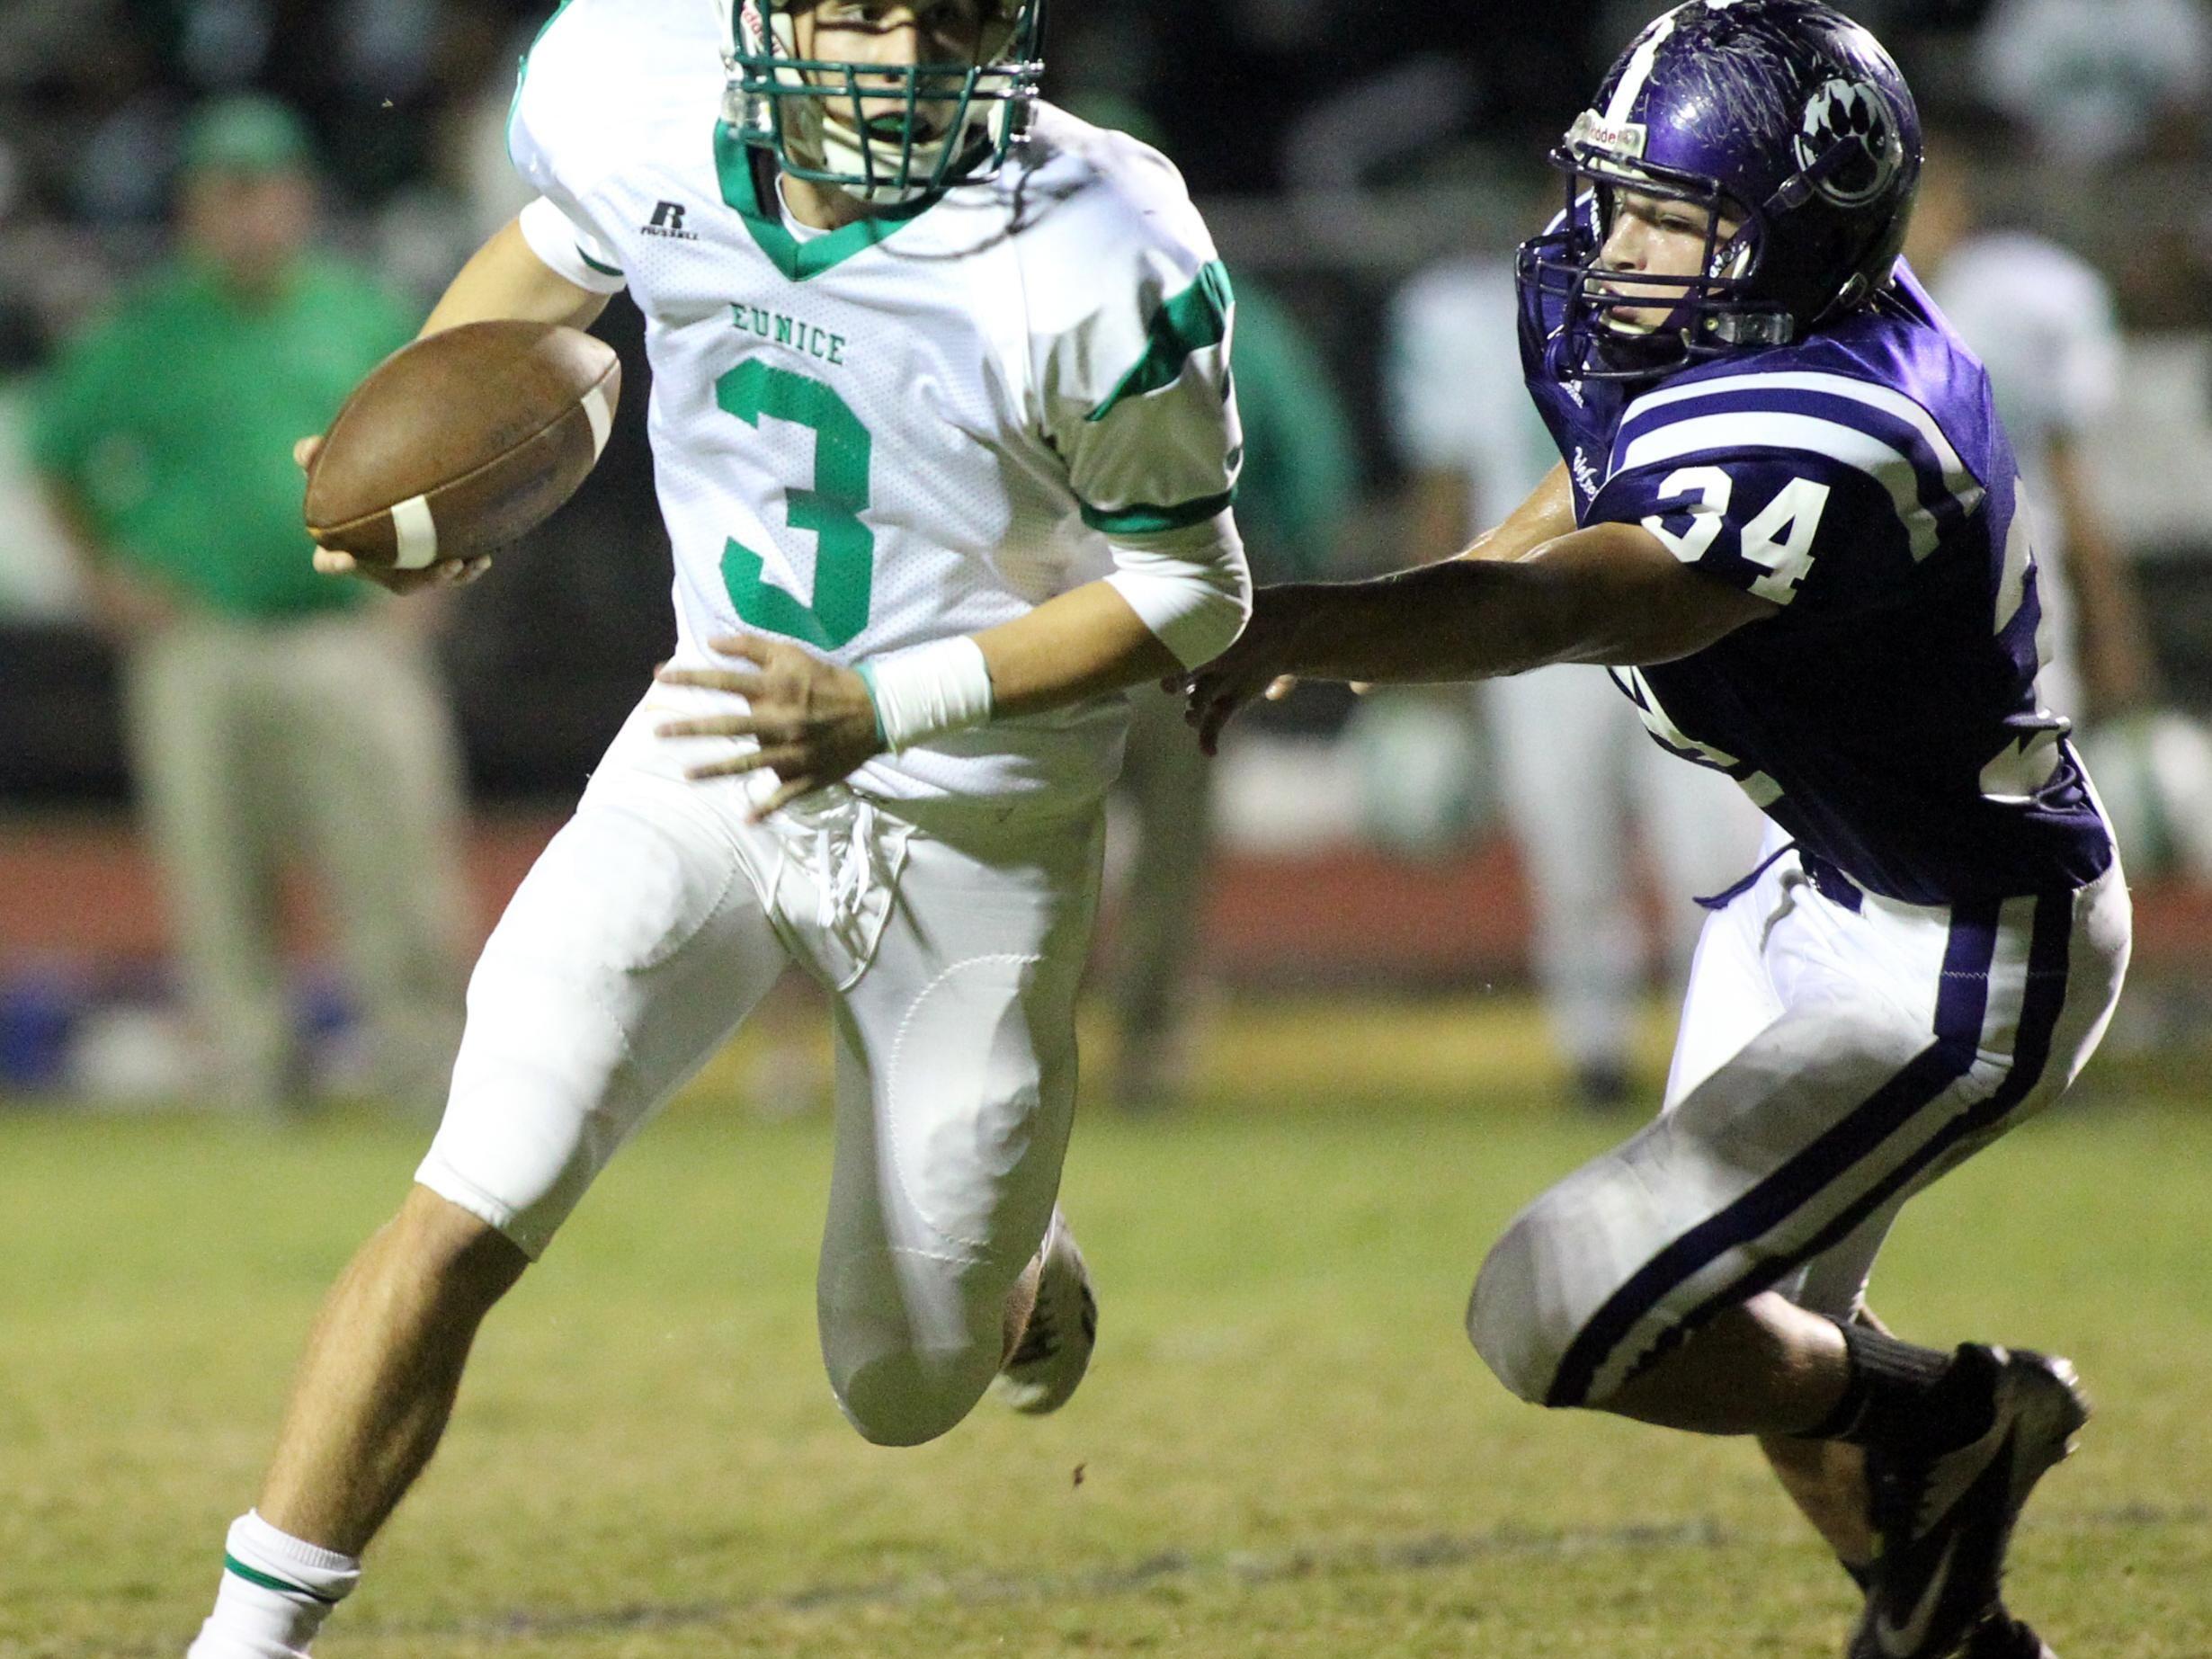 Eunice quarterback Alex Richard (3) scrambles around a Rayne defensive lineman.